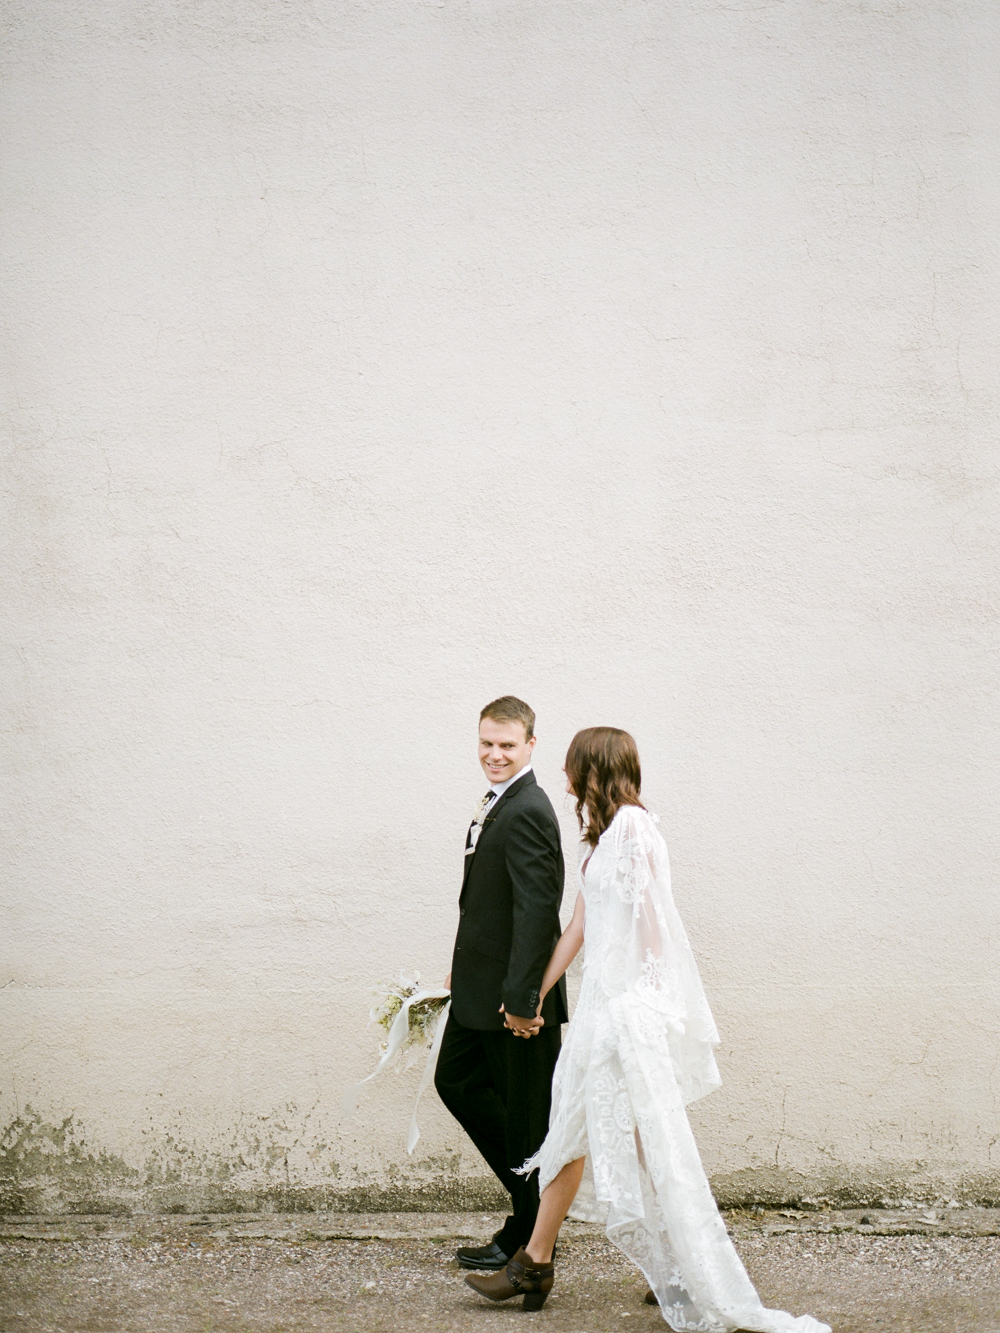 Marfa wedding photographer- destination wedding photographer-christine gosch - film photographer - elopement photographer-11.jpg